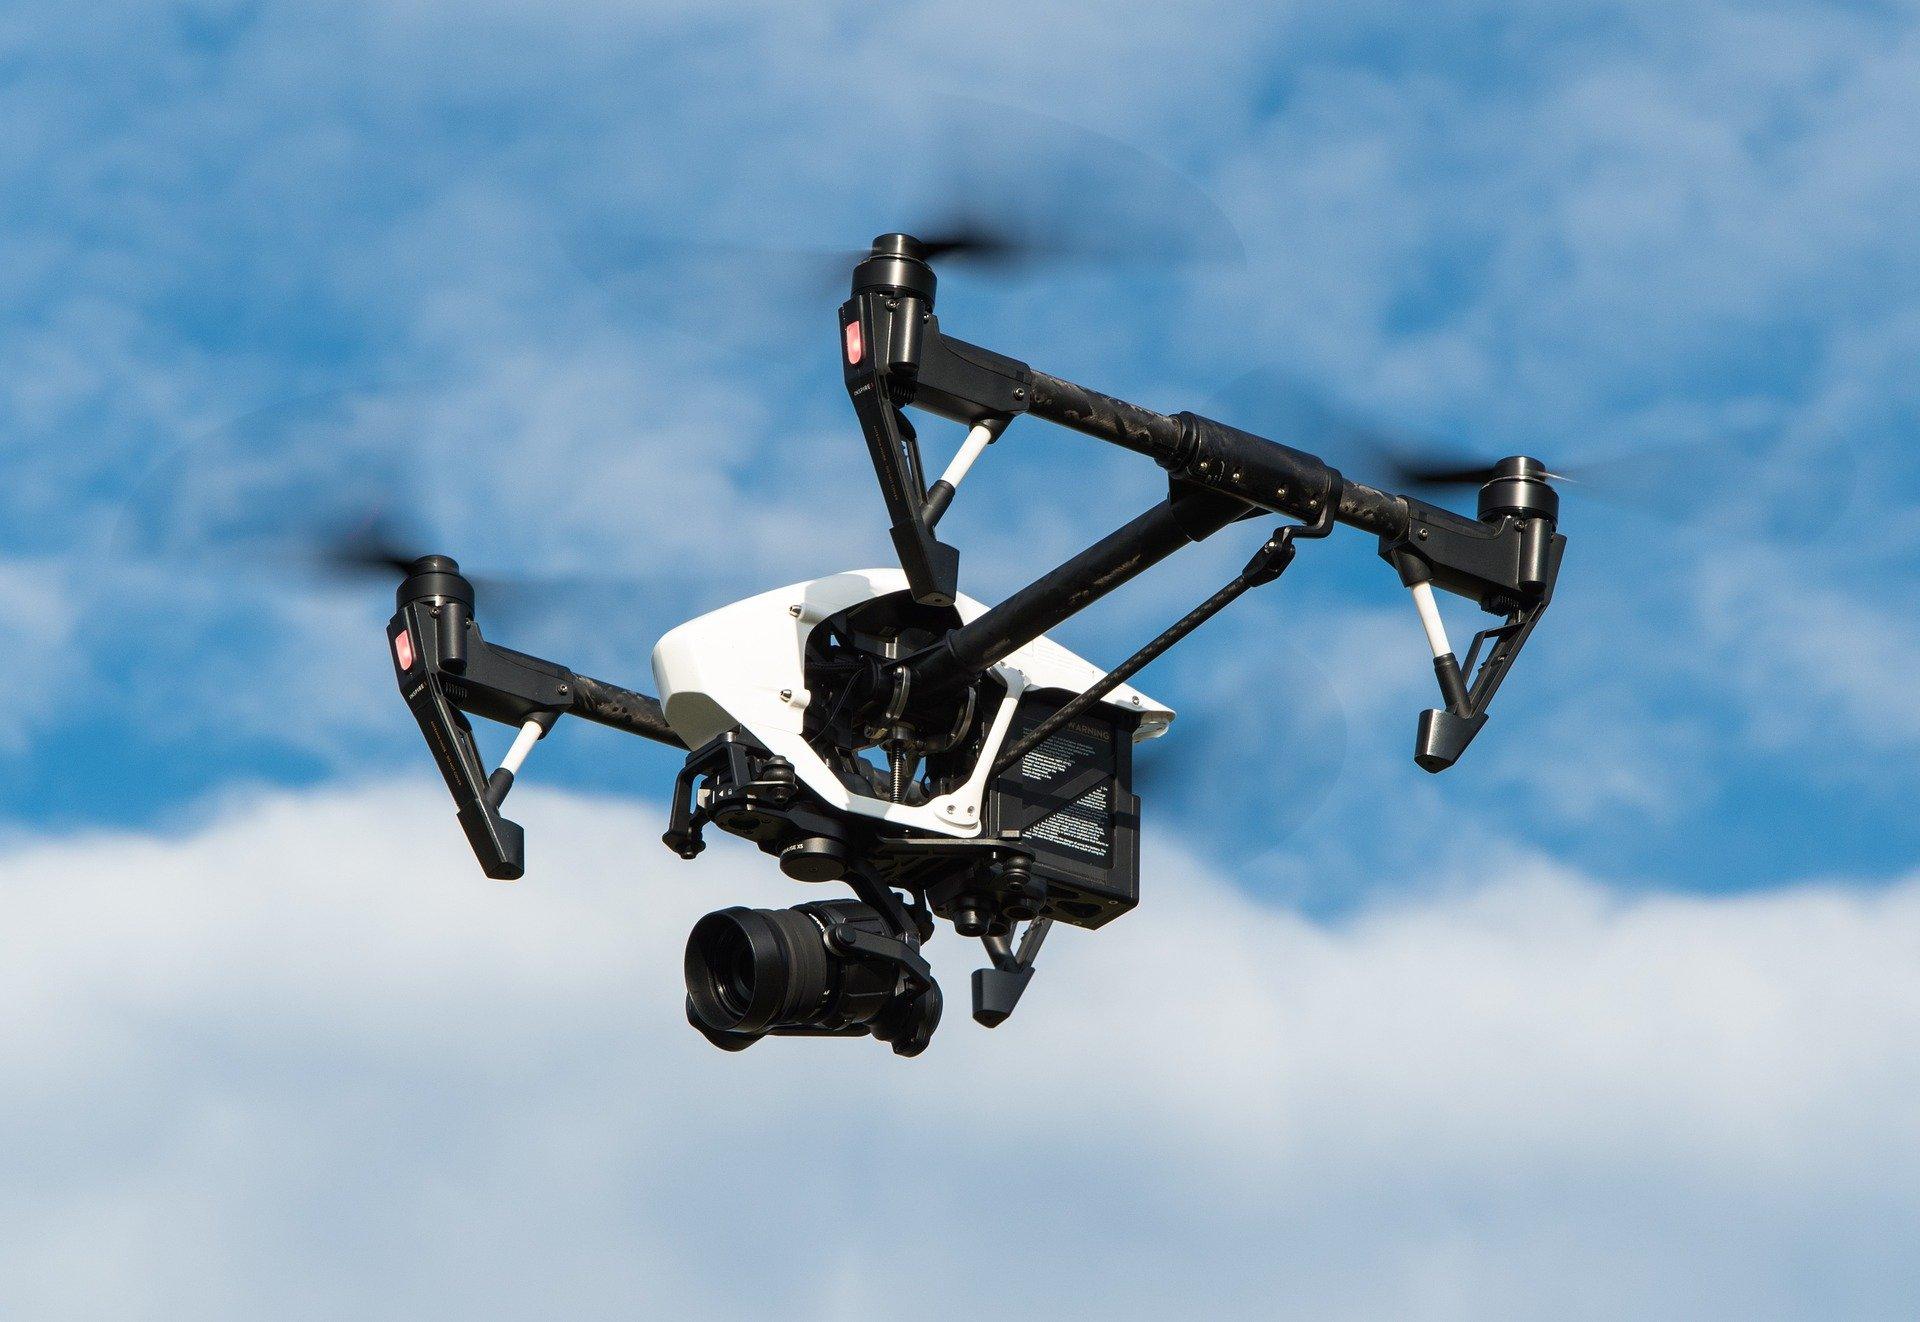 ANTI-DRONE MARKET